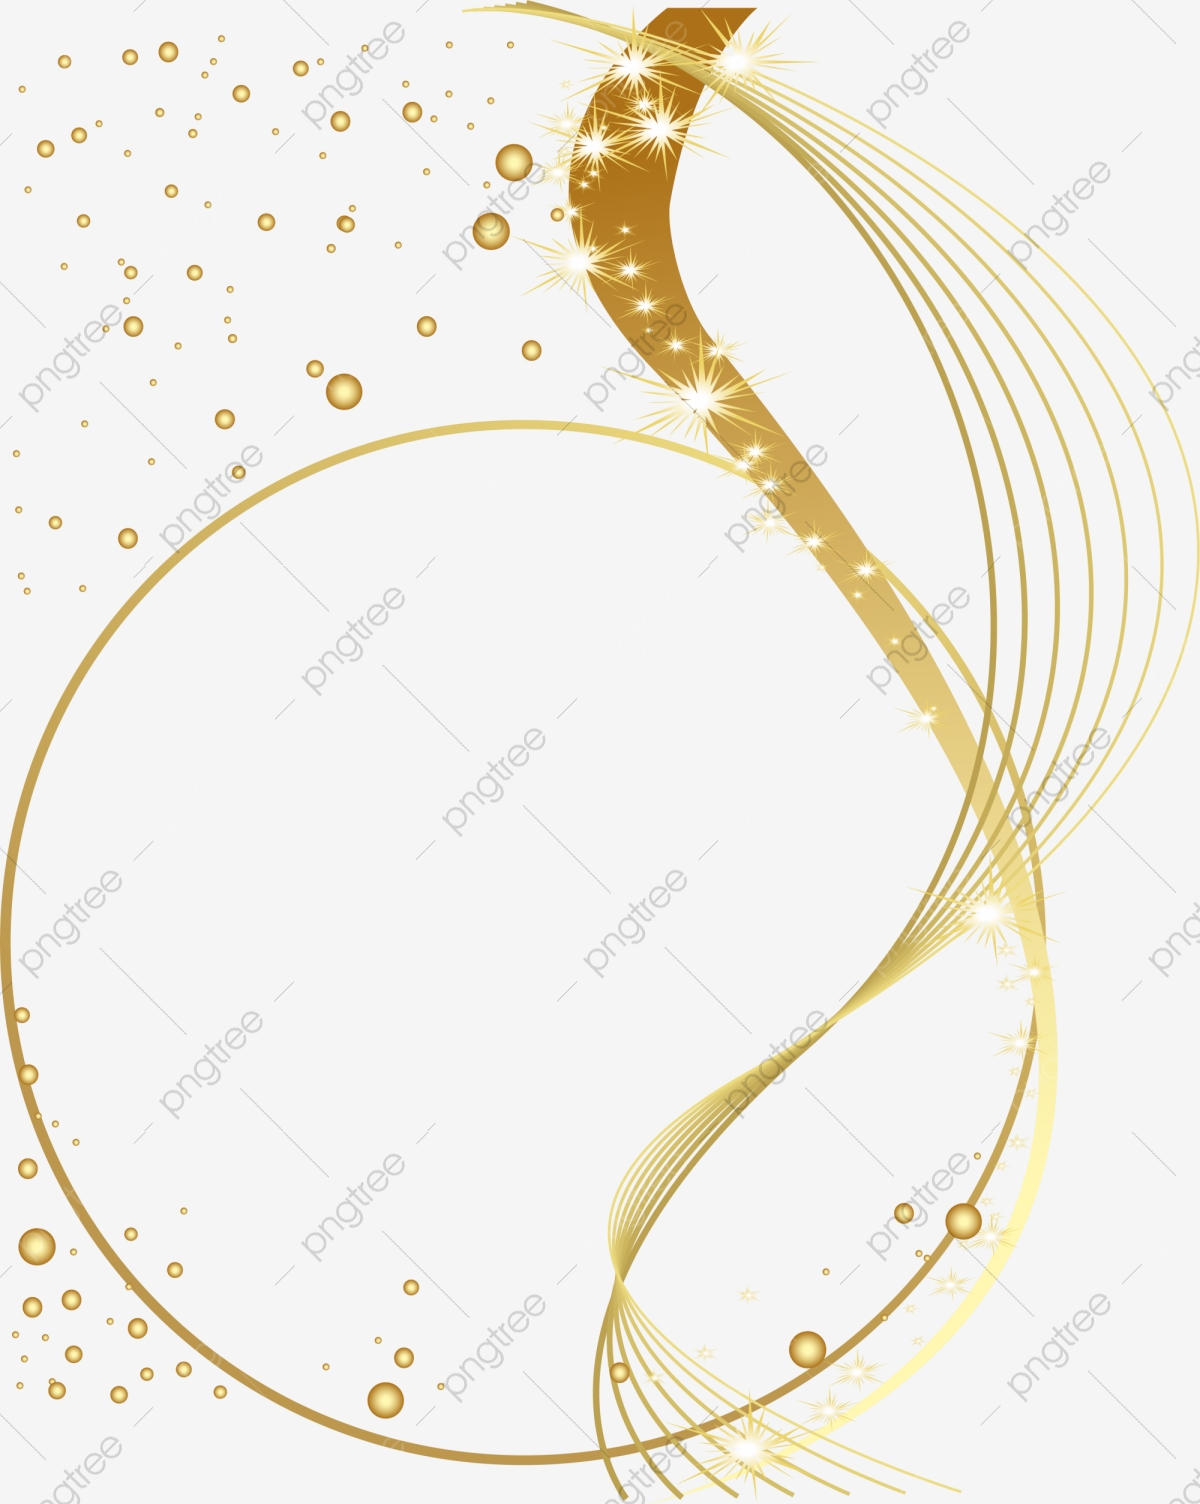 Gold Shines Rays Shine, Golden, Shine, Line PNG Transparent Image.